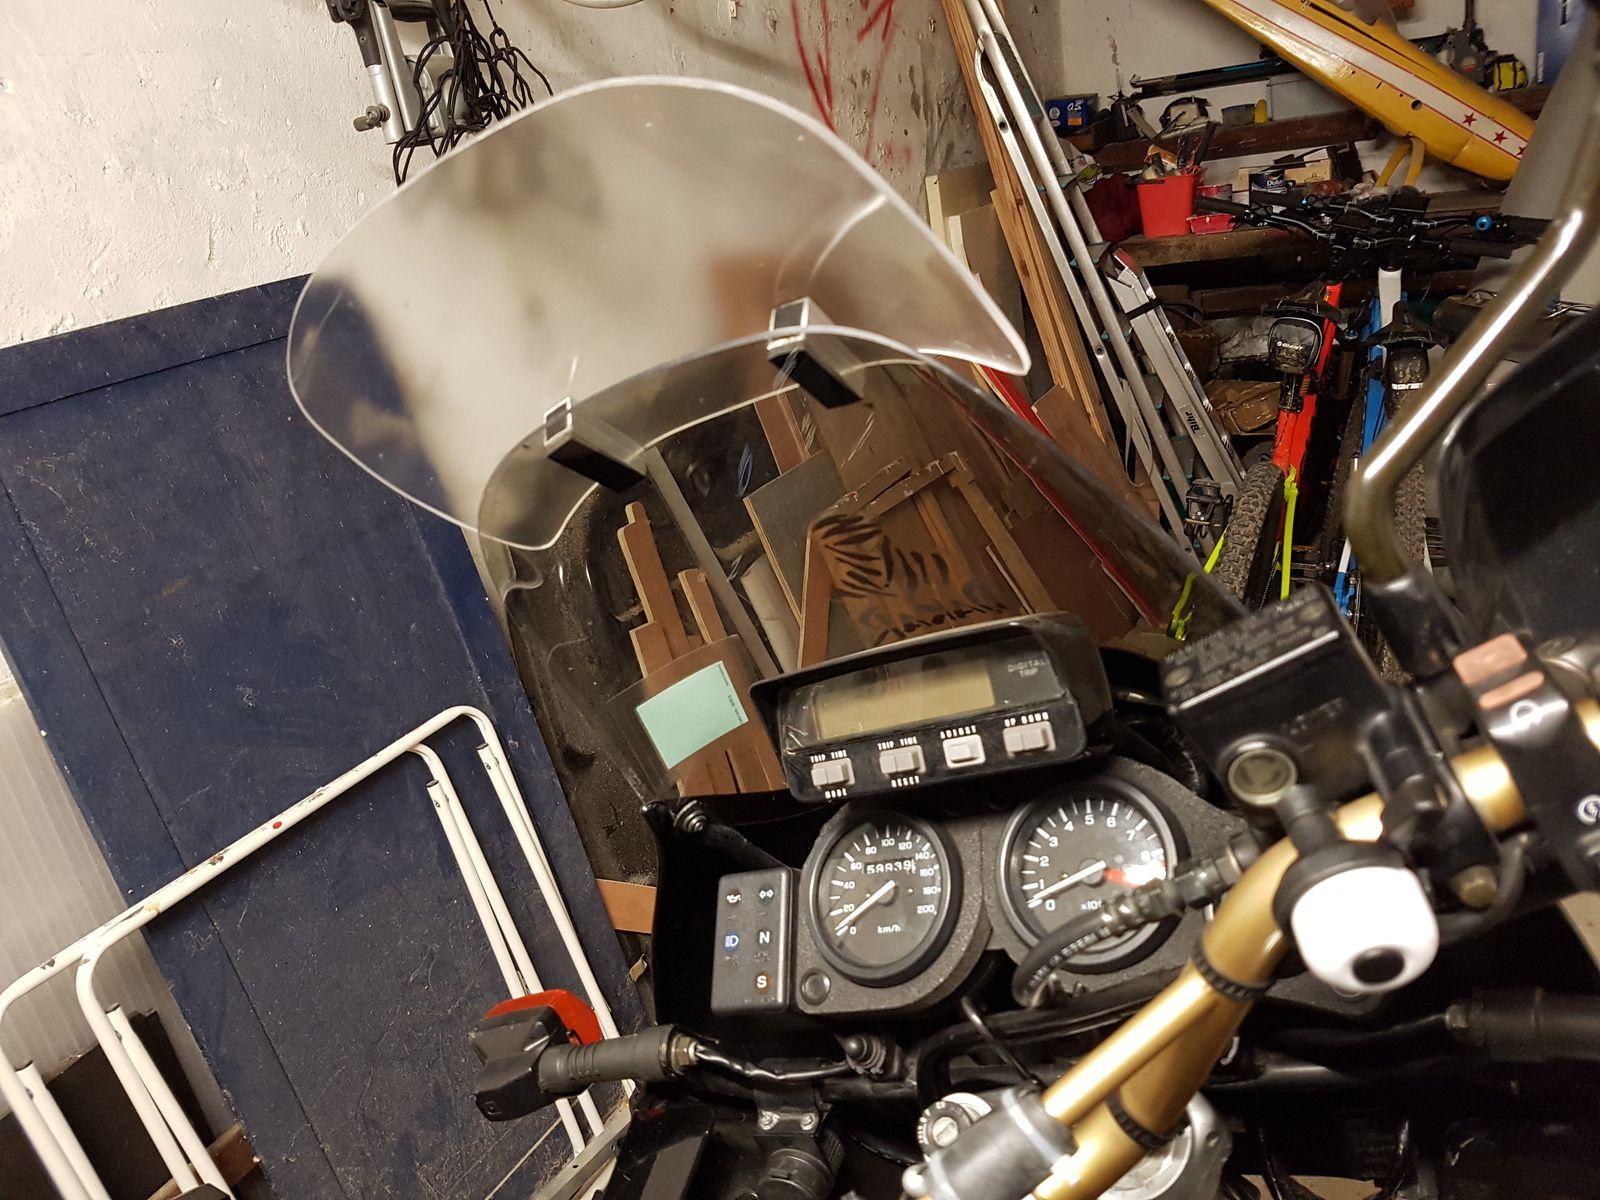 Ma moto: Africa Twin 750 RD07 - 58.000kms. Un charme Ob_9cdce2_20170508-210431